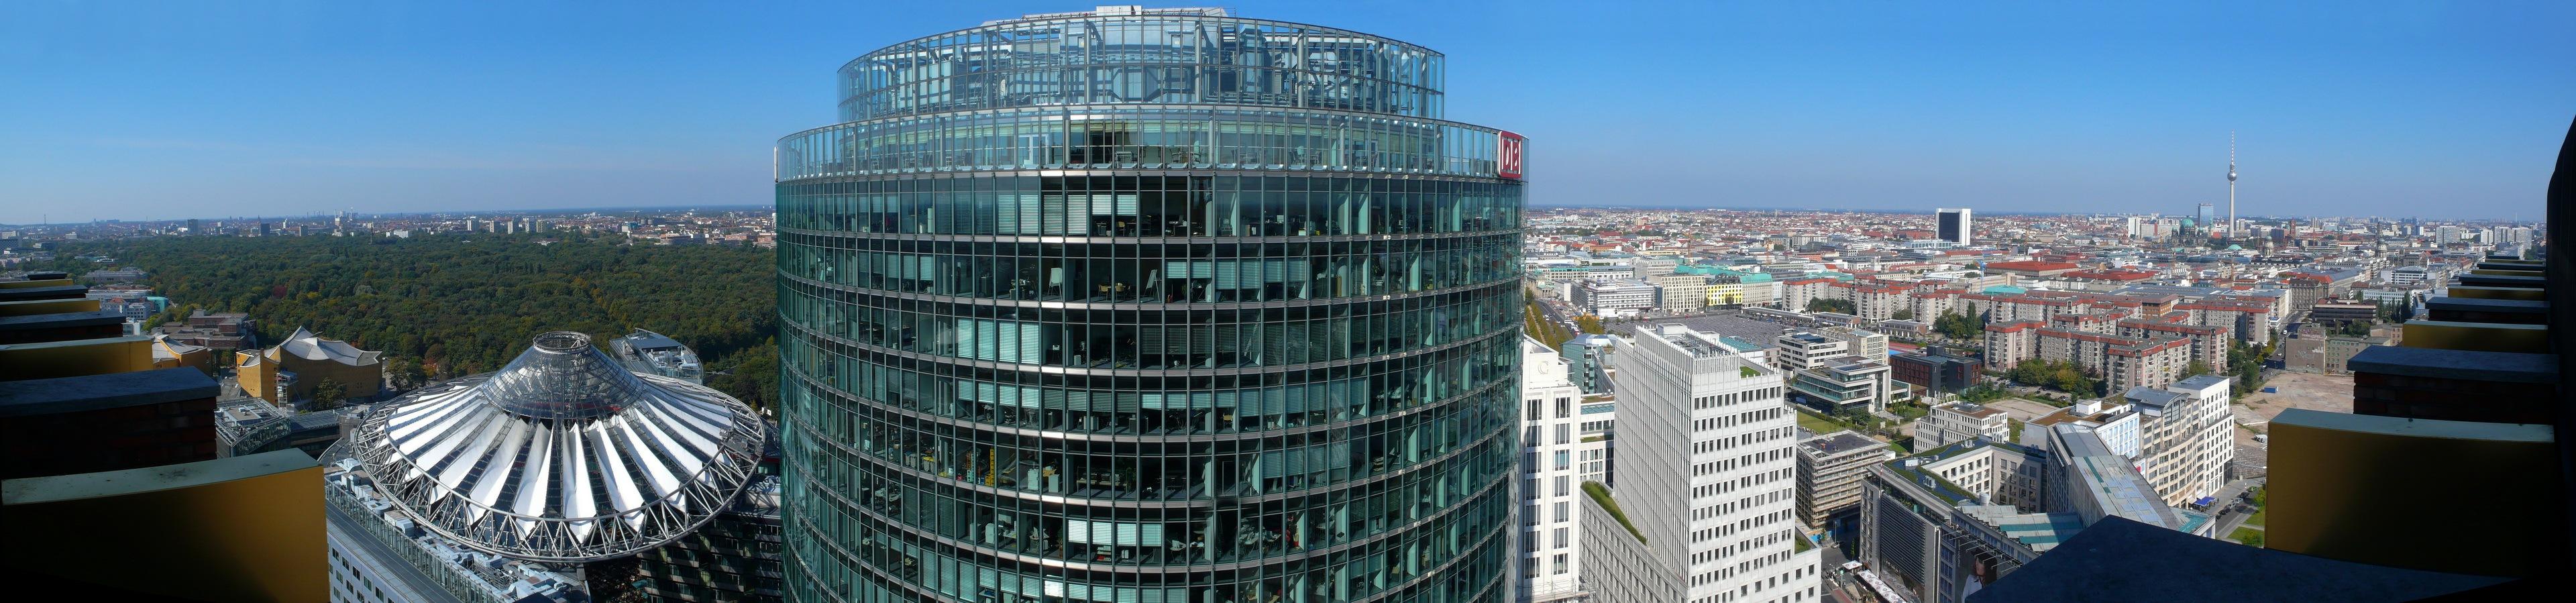 berlin_panorama_kollhoff-tower_1